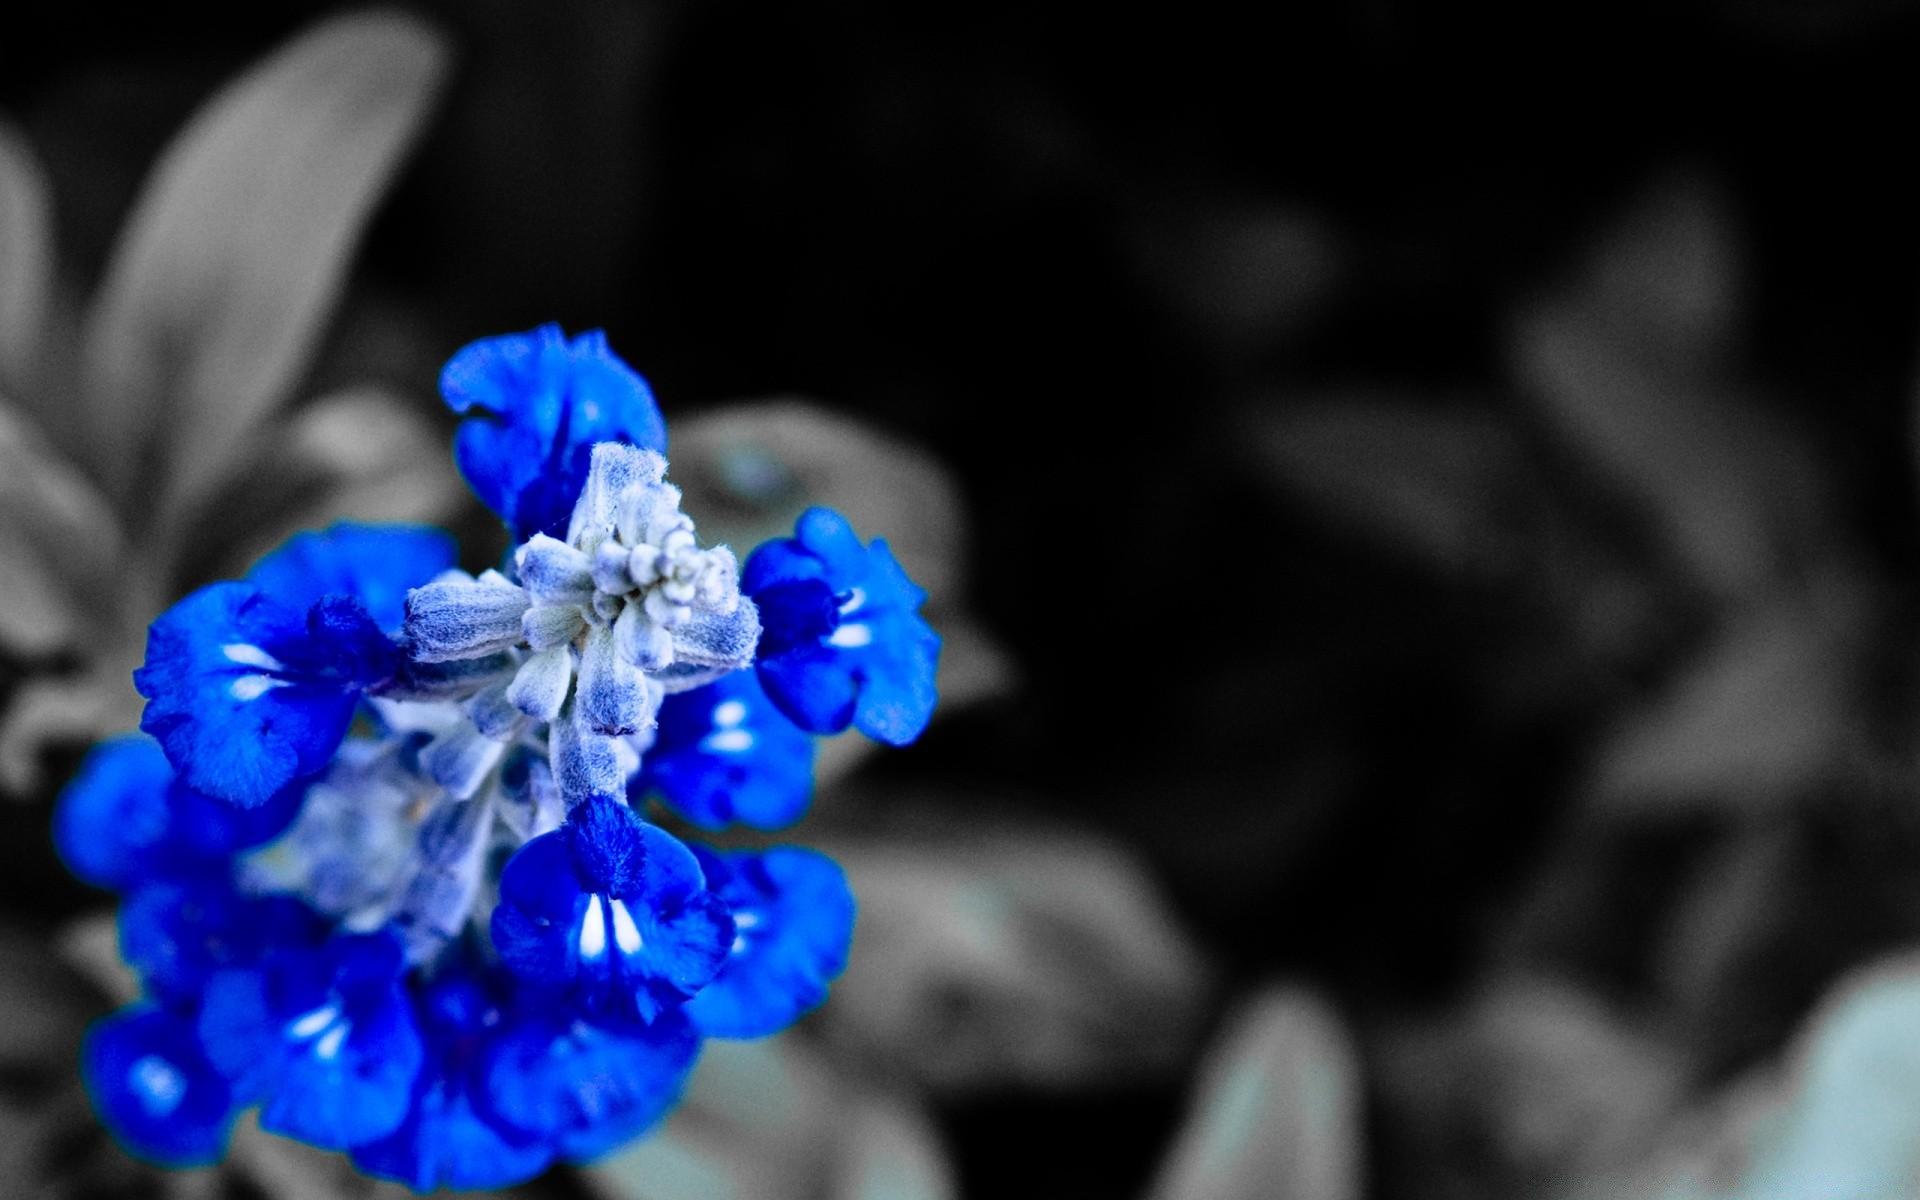 того, картинки синие цветы обои на телефон обусловлено тем